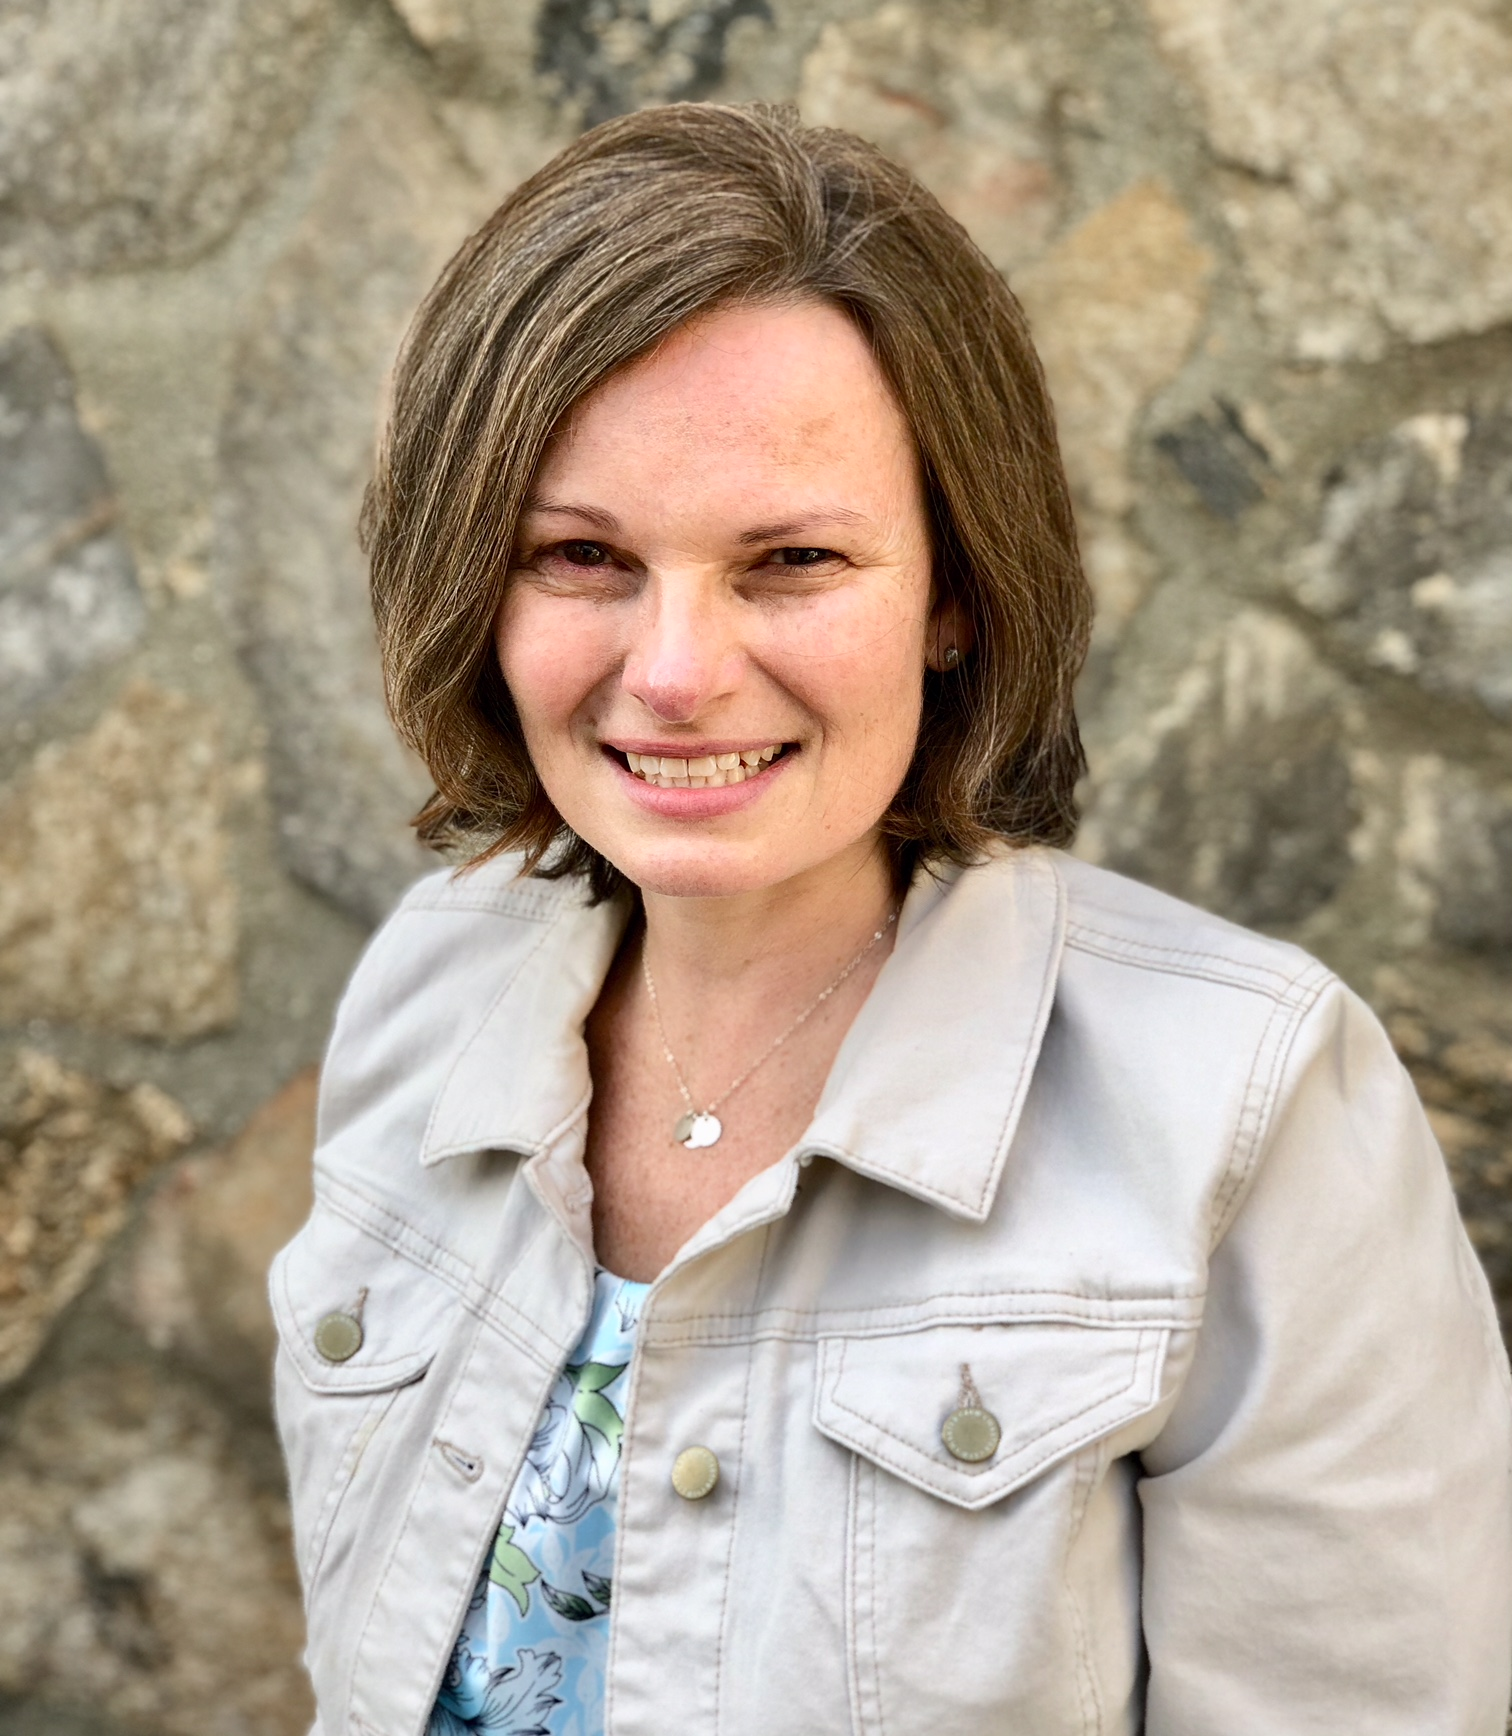 Katherine Cardinal, M.S. Gerontologist - PHOTO: MICHAEL TEWEY